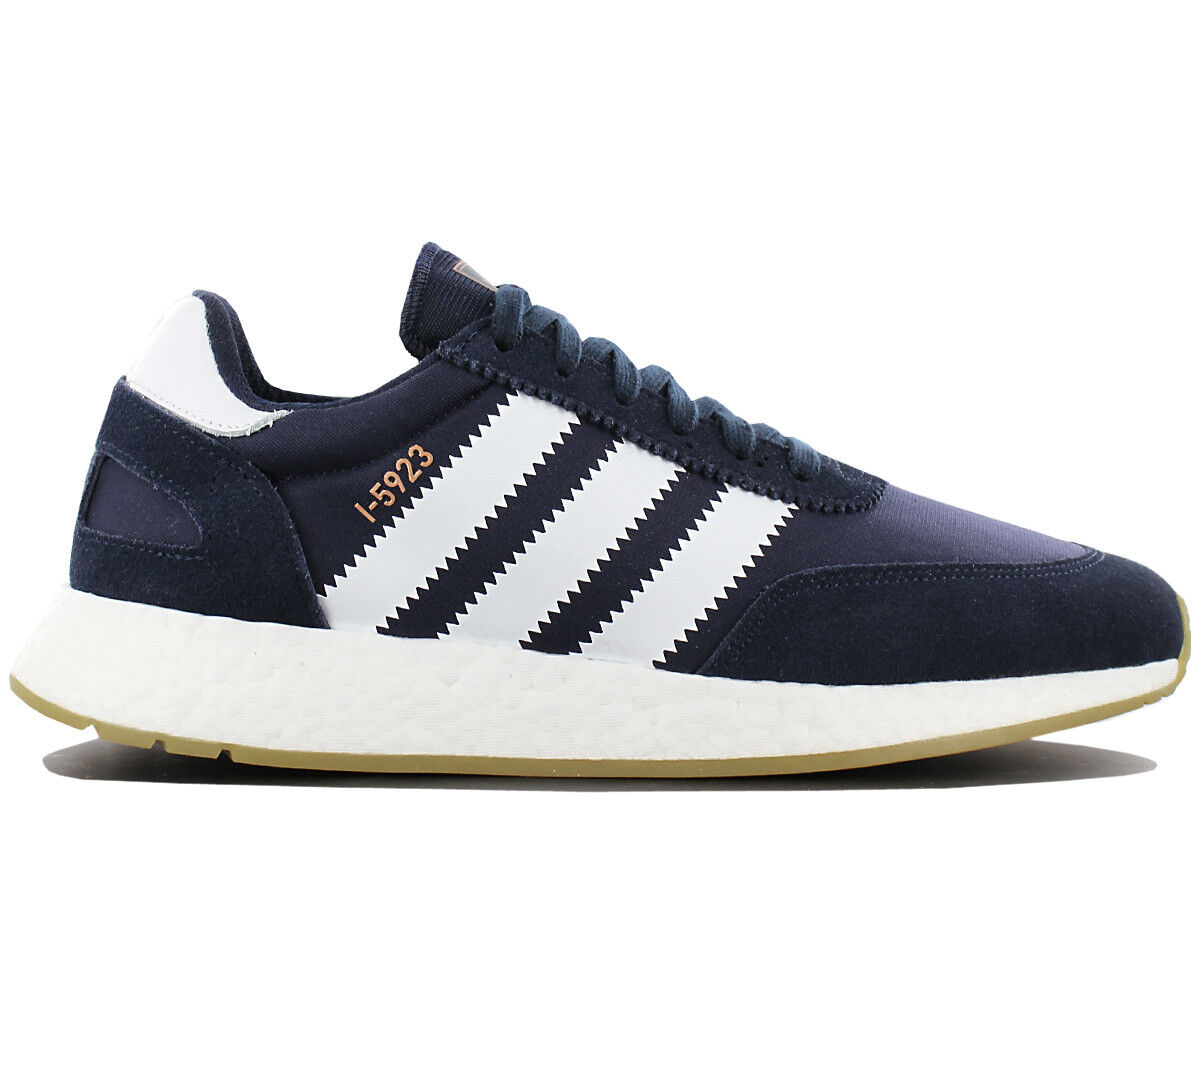 Adidas Originals Iniki i-5923 BOOST MEN'S SNEAKERS RETRO SHOES BB2092 Trainers